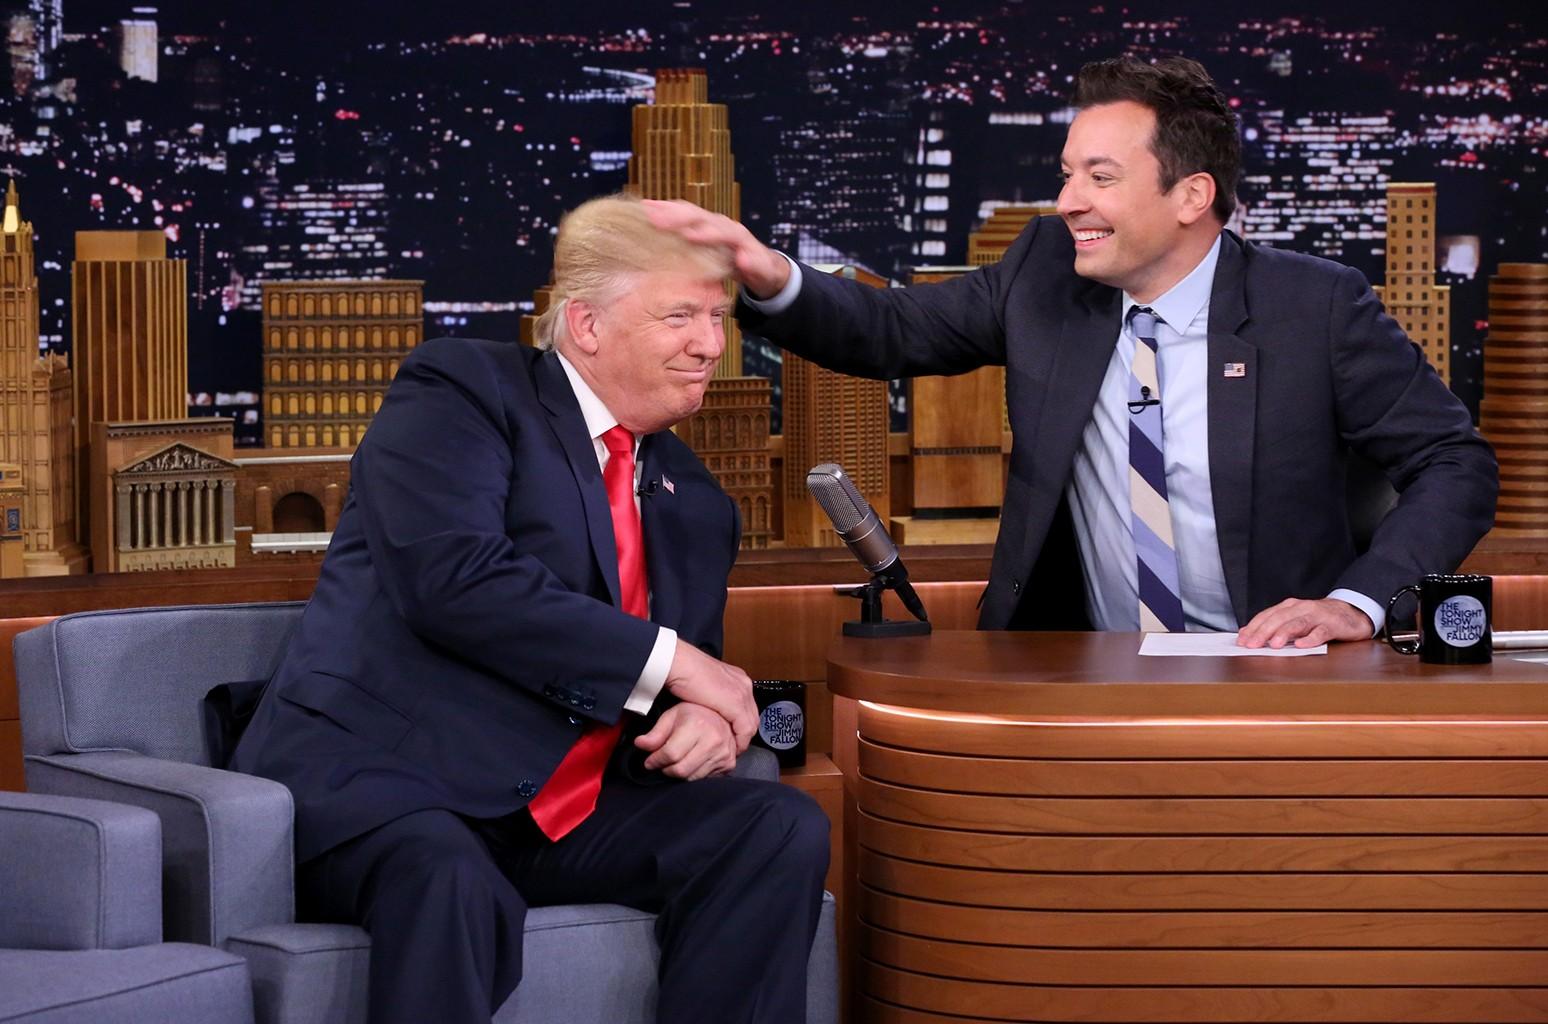 Donald Trump and Jimmy Fallon